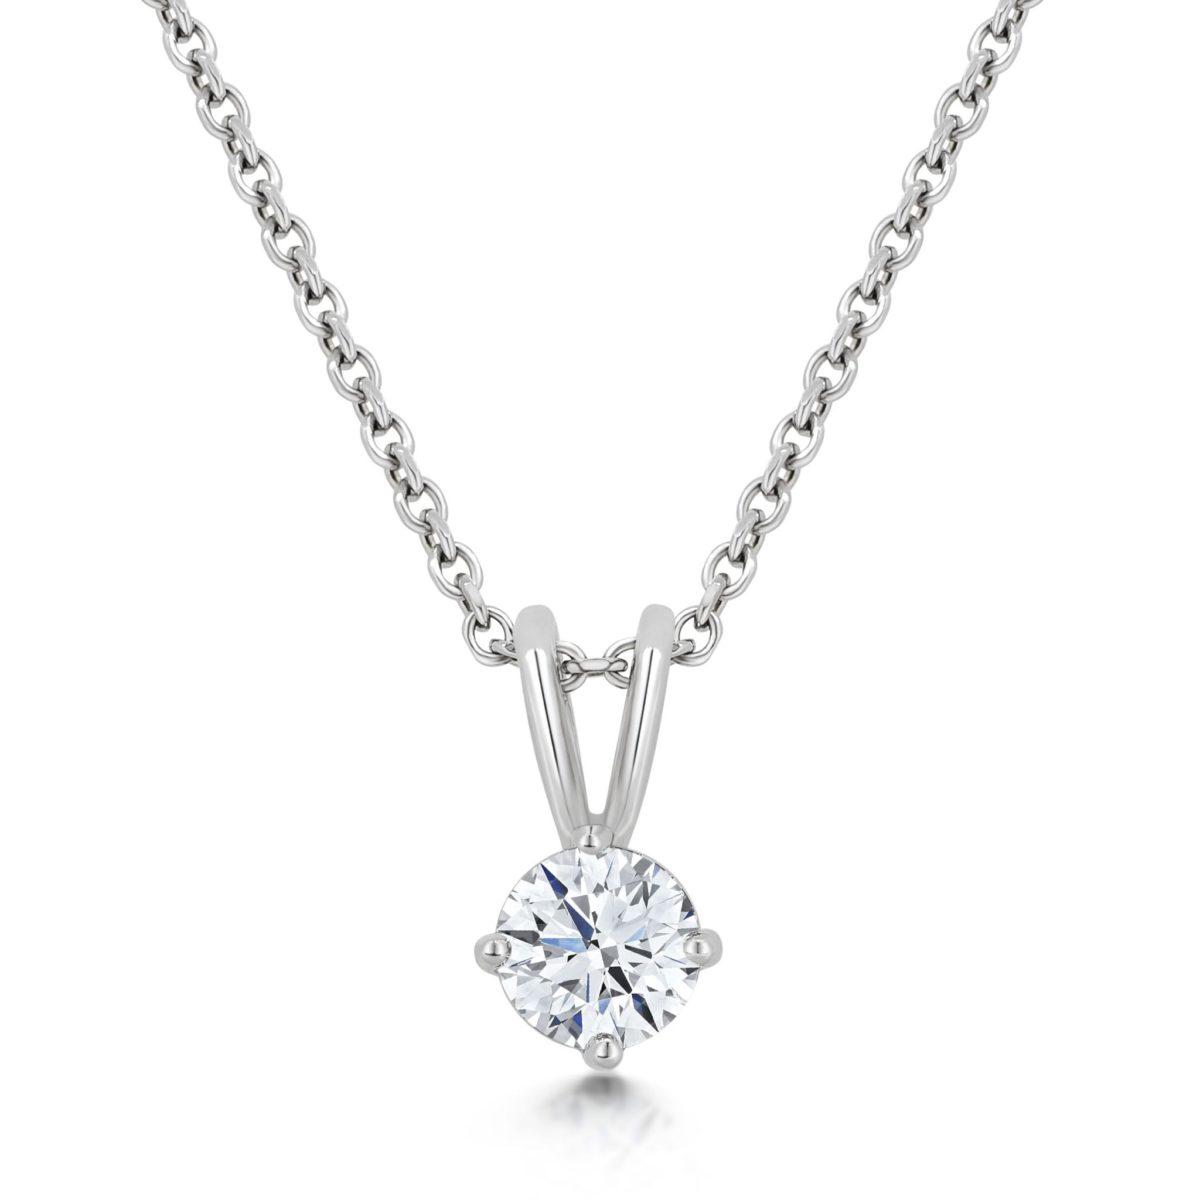 Ellie Round Cut Diamond Solitaire Pendant